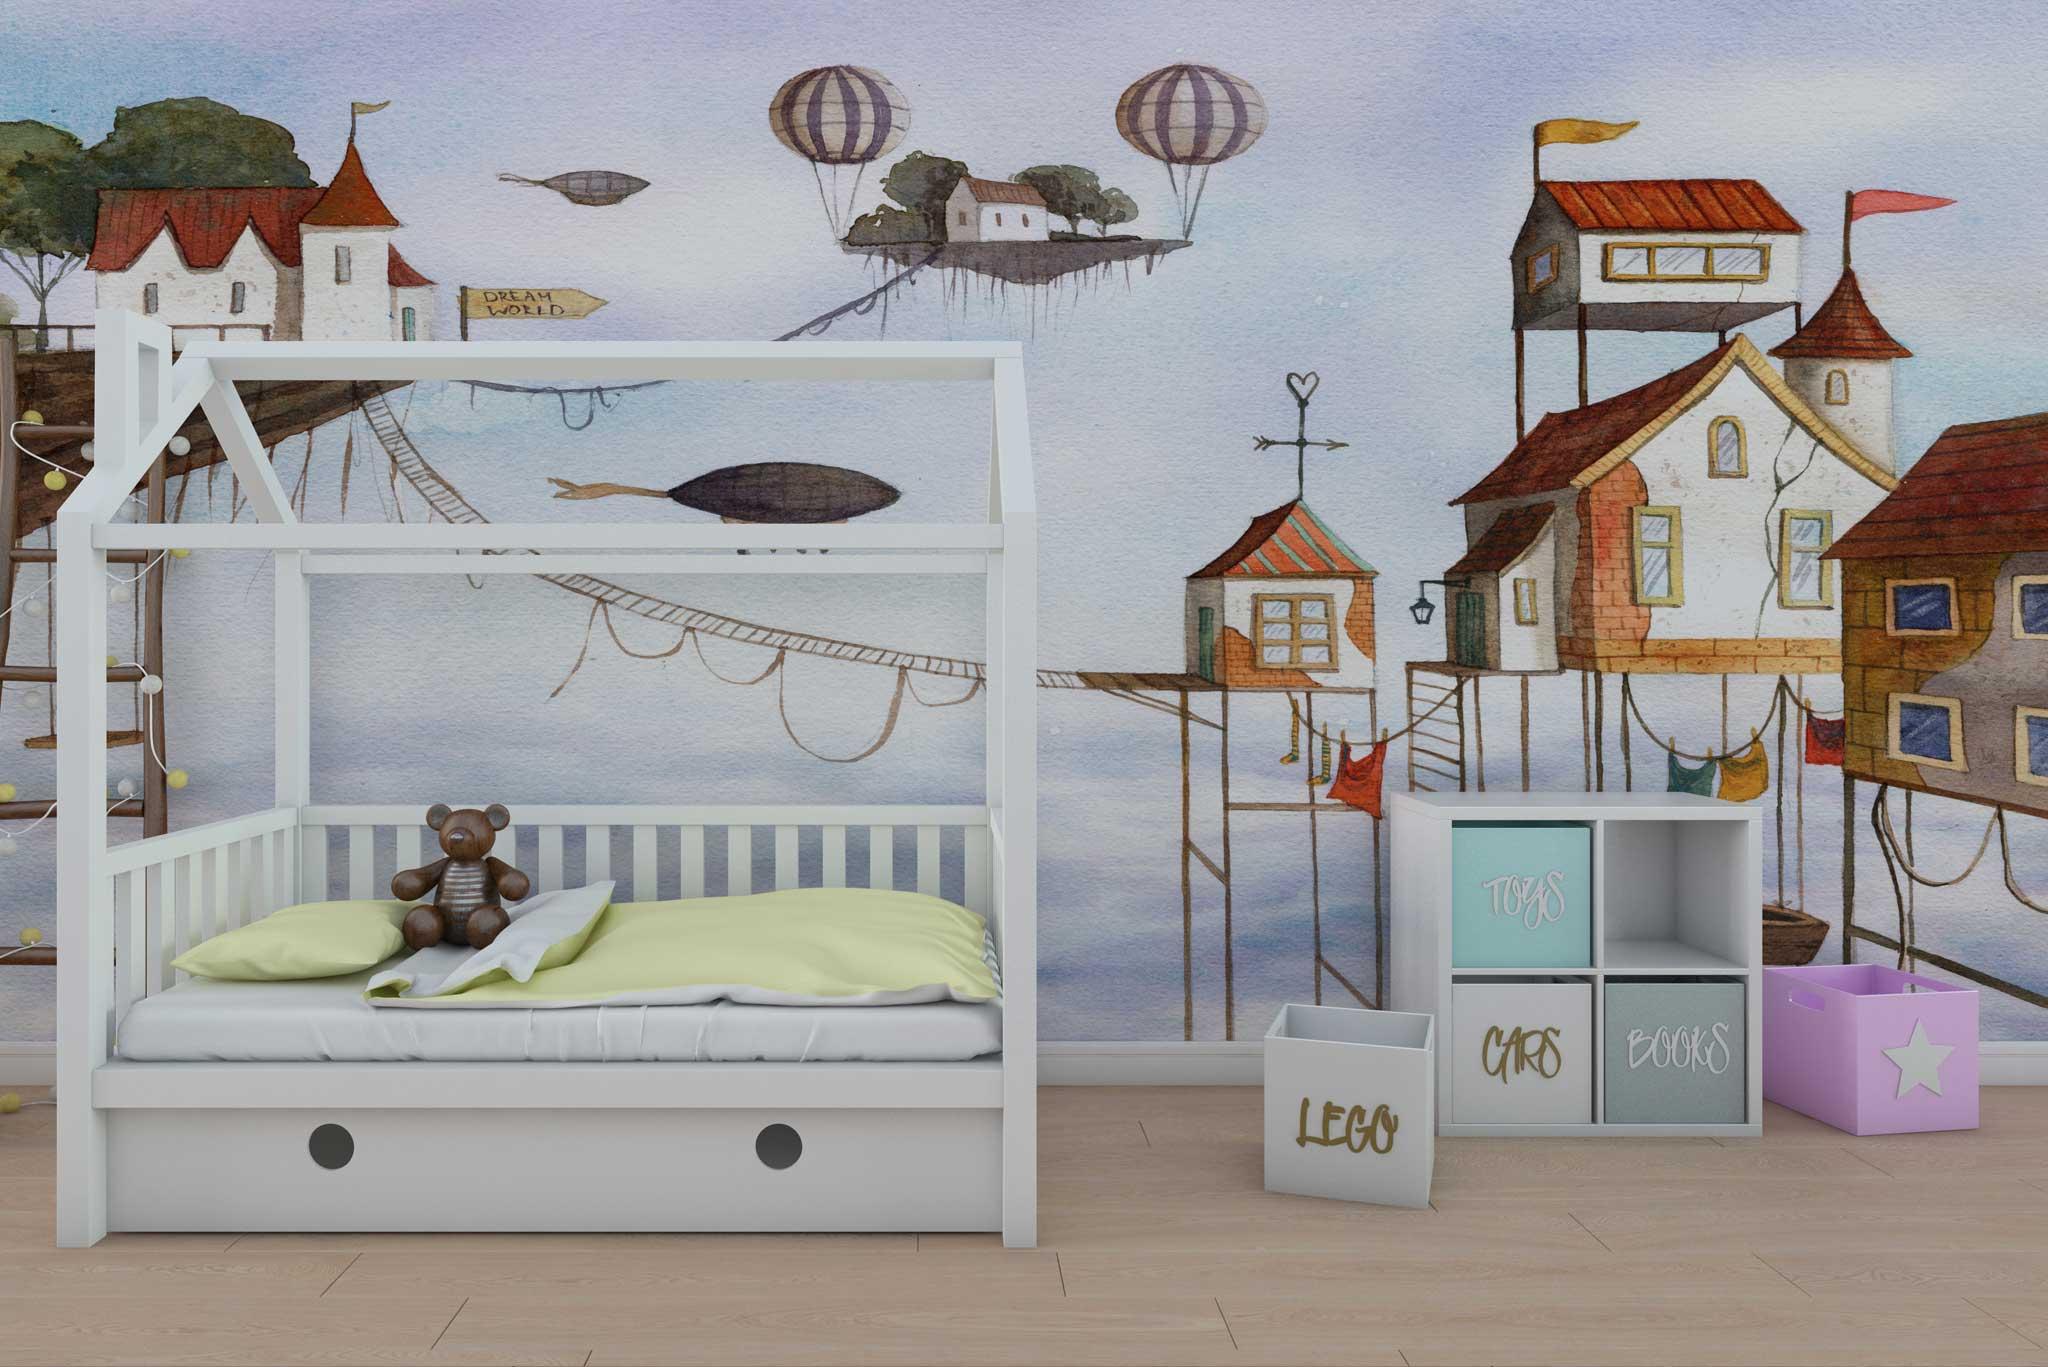 tapet-fototapet-special-personalizat-comanda-bucuresti-camera-dormitor-copii-perete-pat-design-interior-case-casute-poveste-fantastic-imaginatie-calatorie